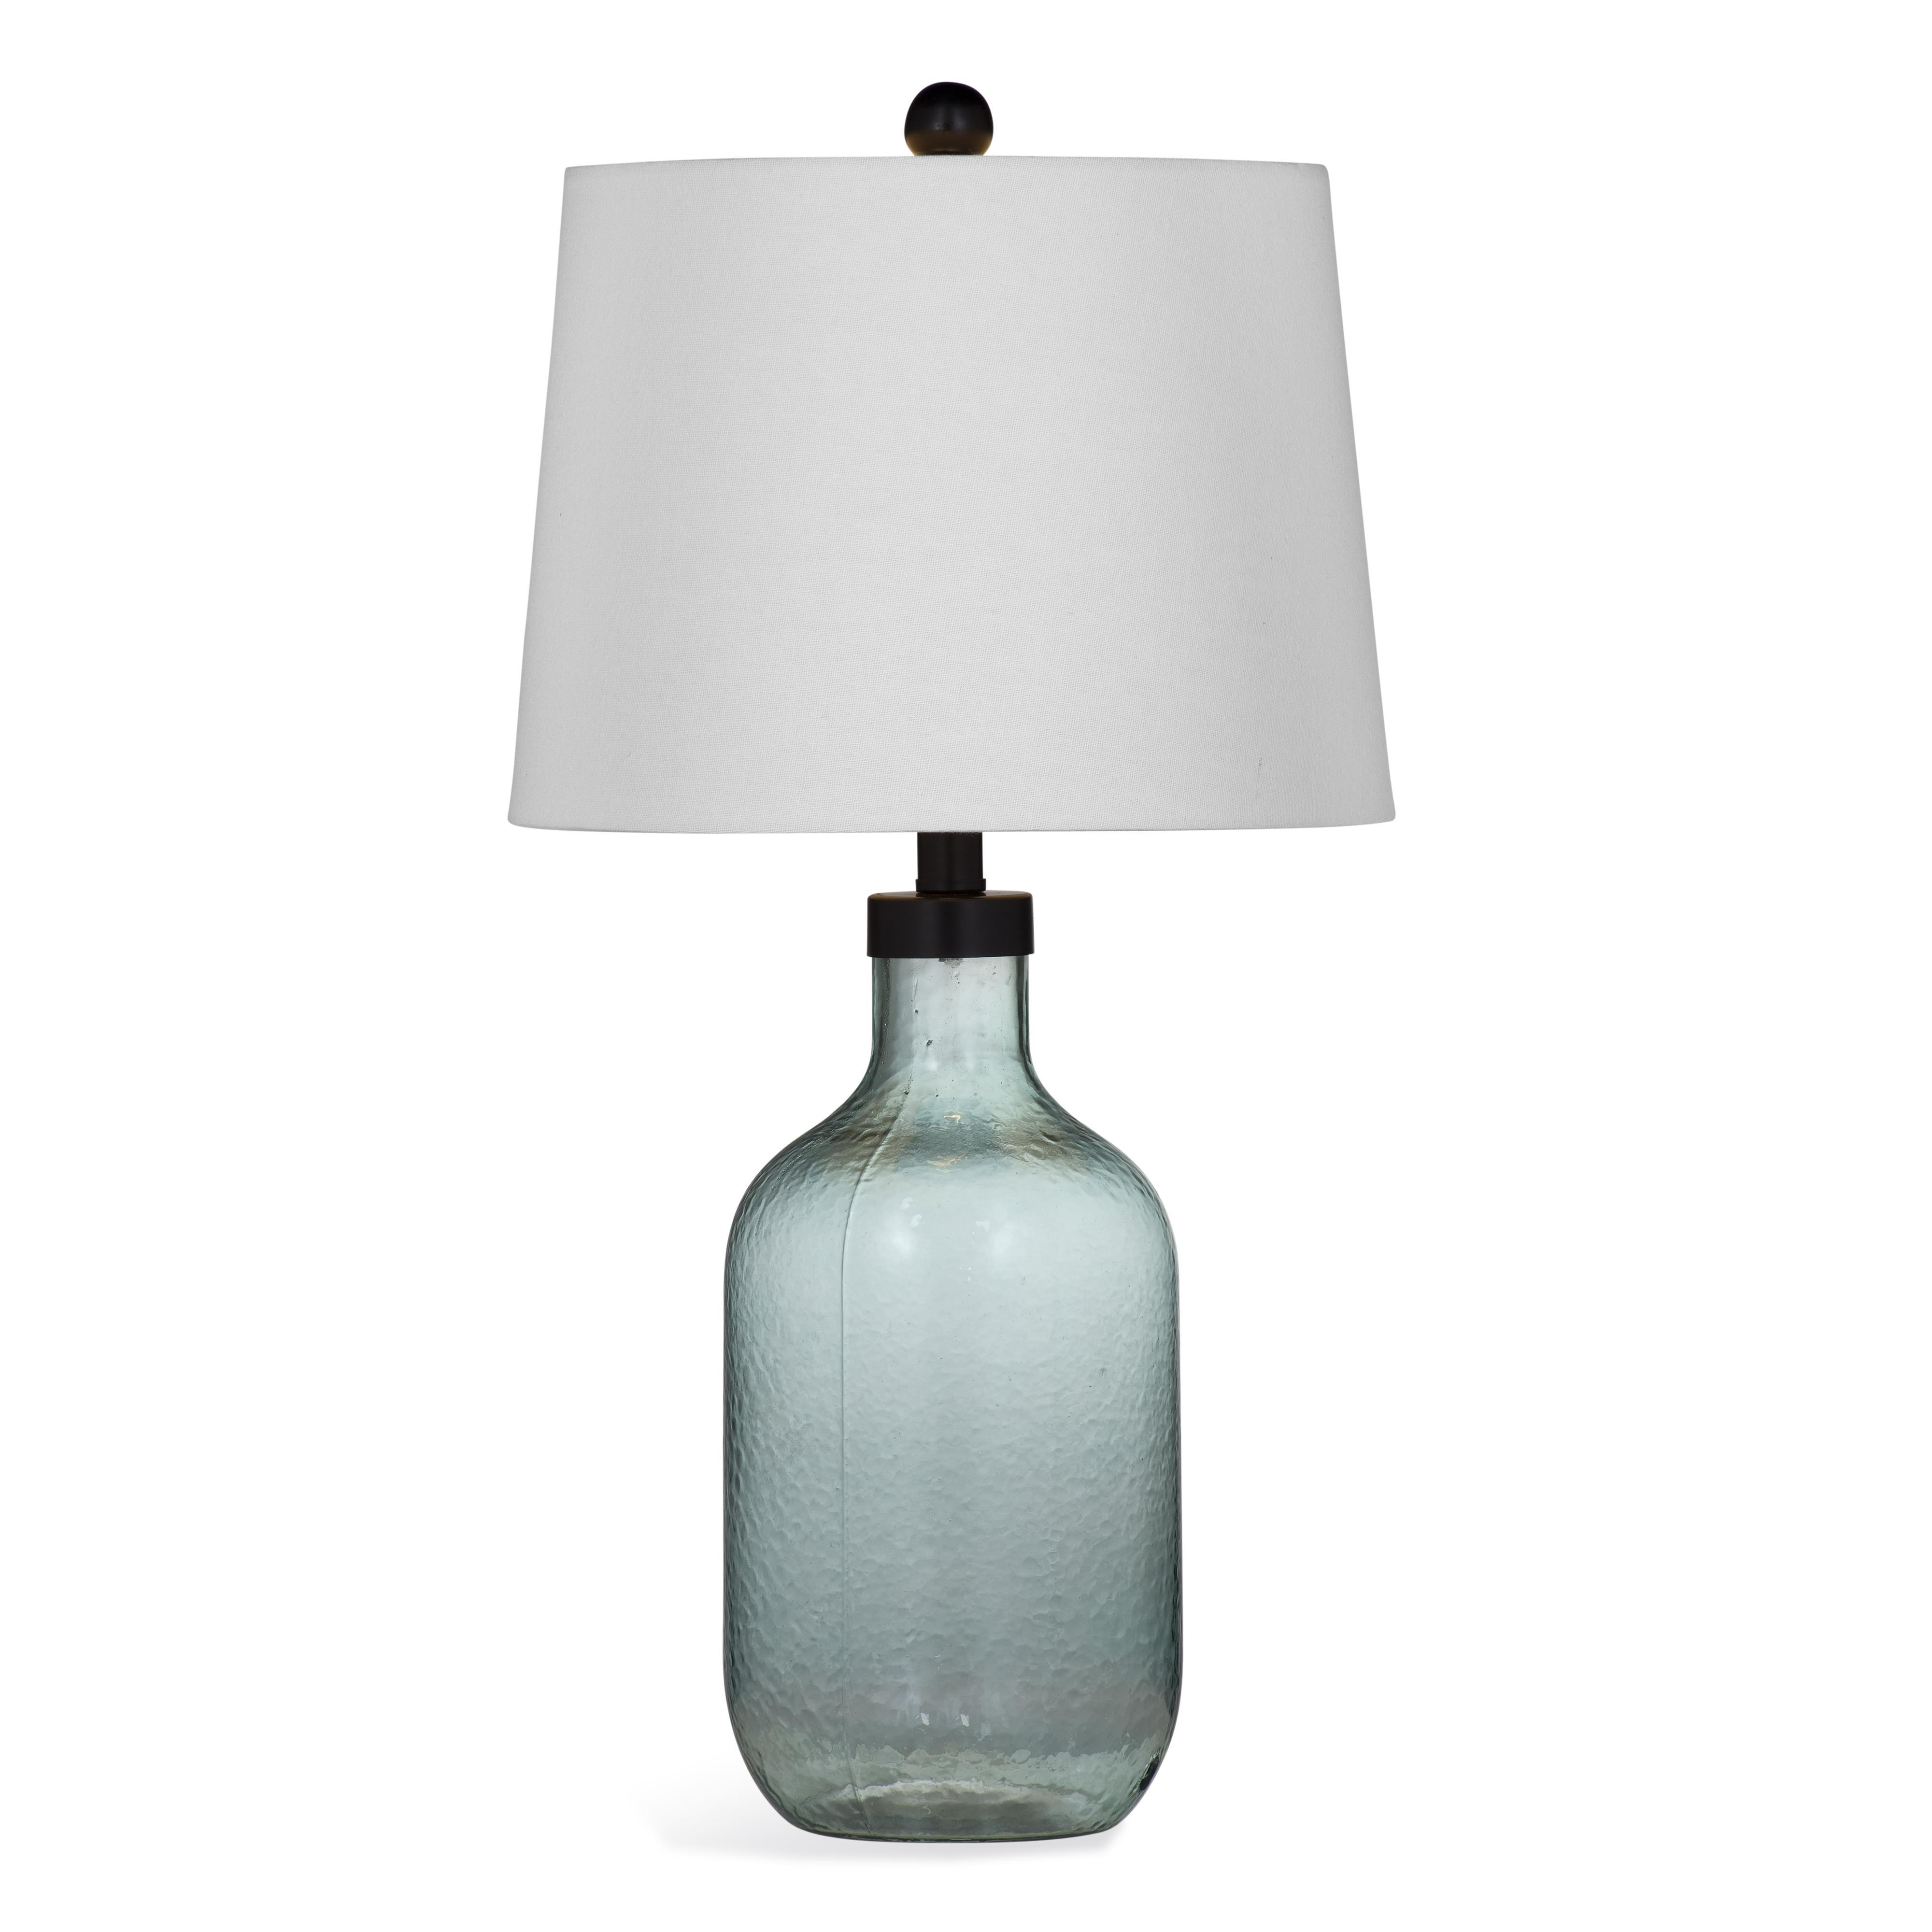 Pan Pacific Savanna Table Lamp by Bassett Mirror at Bullard Furniture